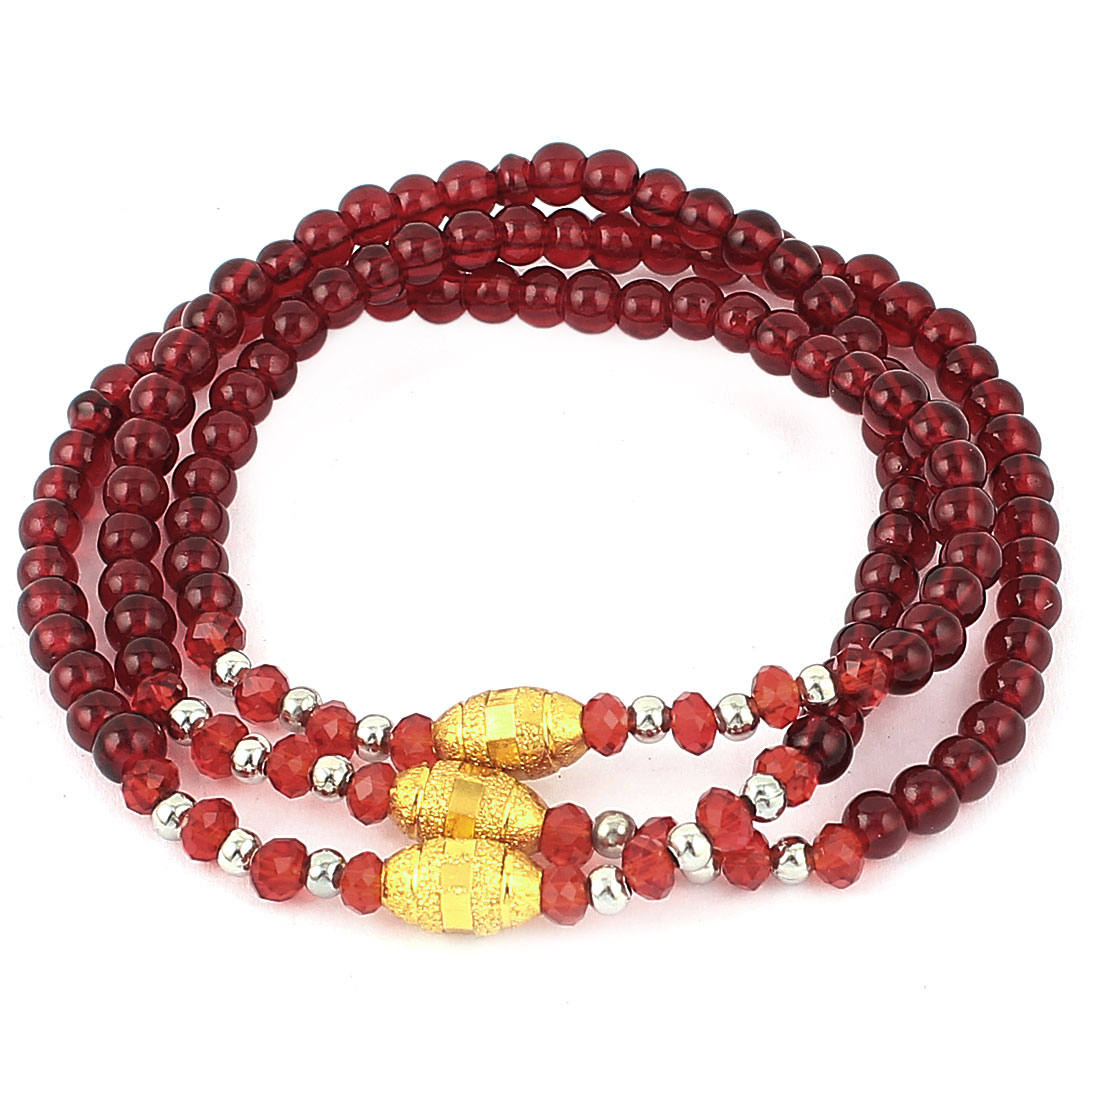 Women Oval Metal Decor Plastic Crystal Beads Linked Bracelet Bangle Carmine